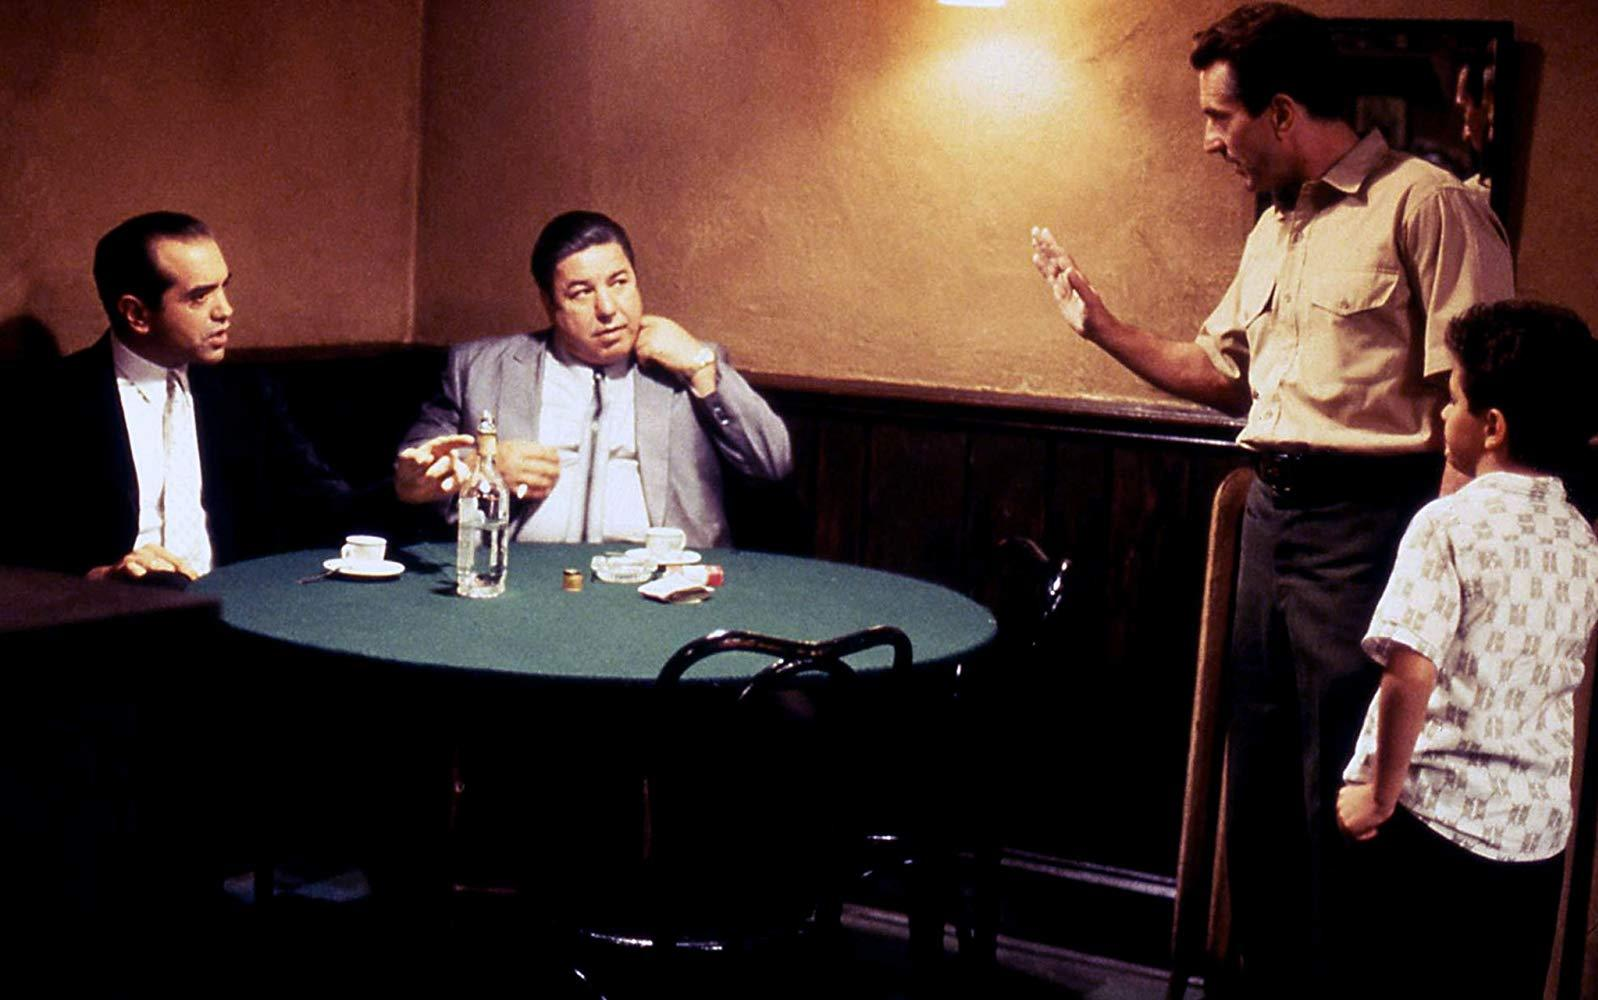 مشاهدة فيلم A Bronx Tale 1993 HD مترجم كامل اون لاين